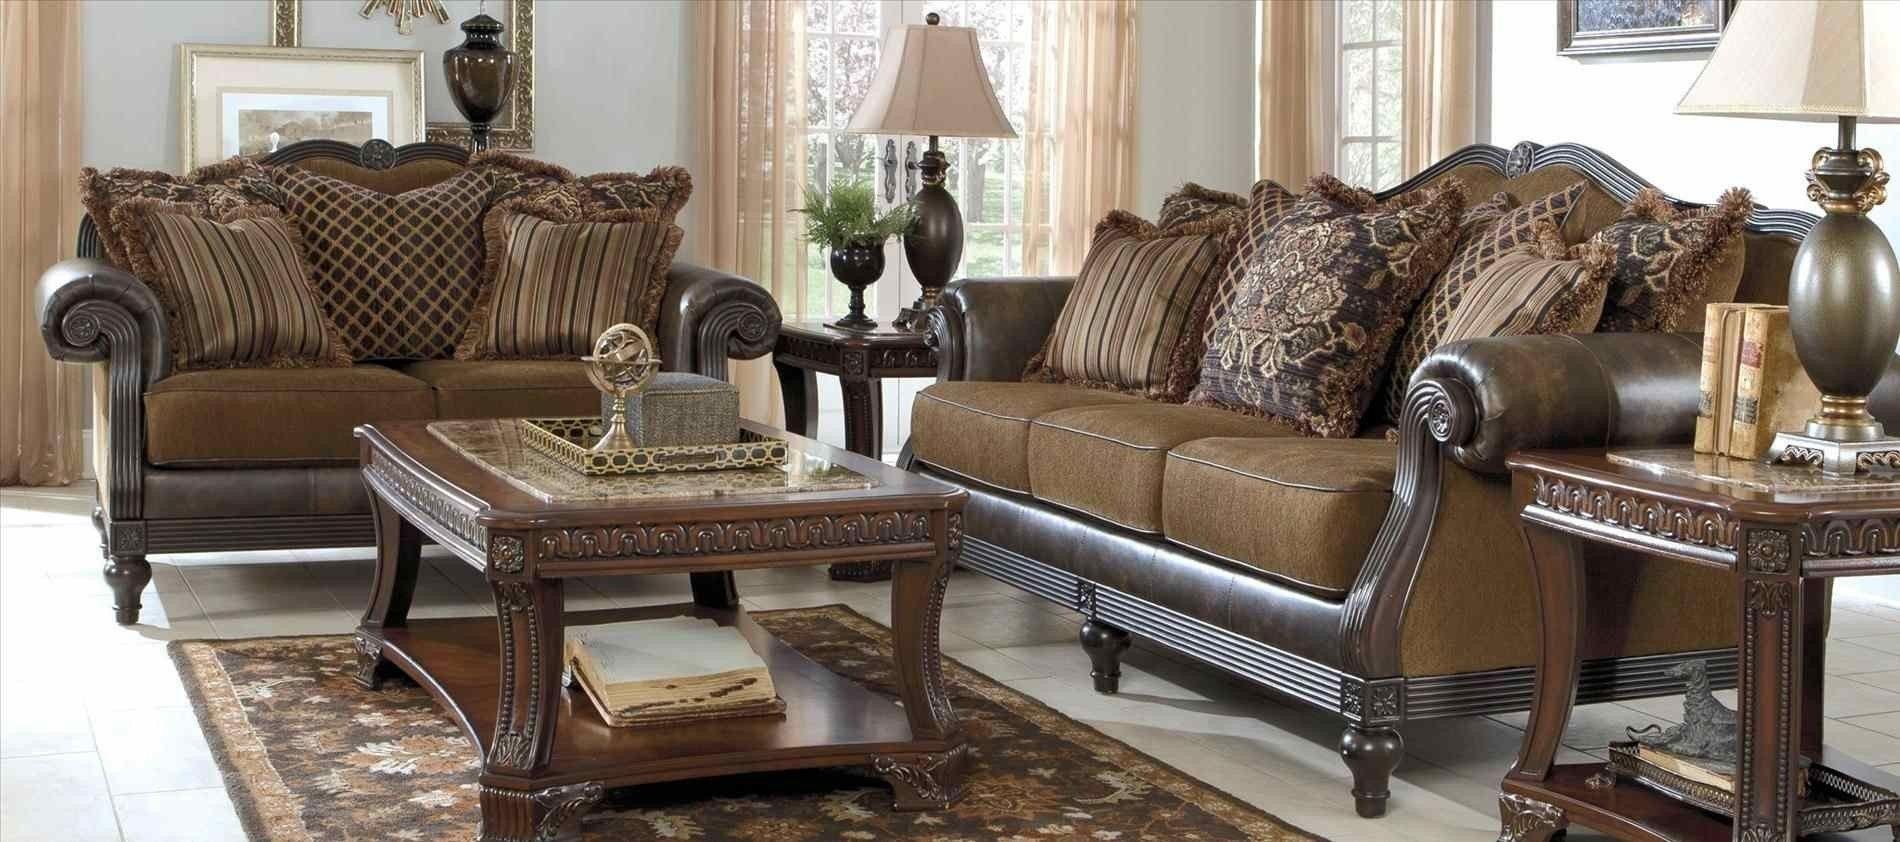 Craigslist Cosas Gratis Houston Ashley Ashley Furniture